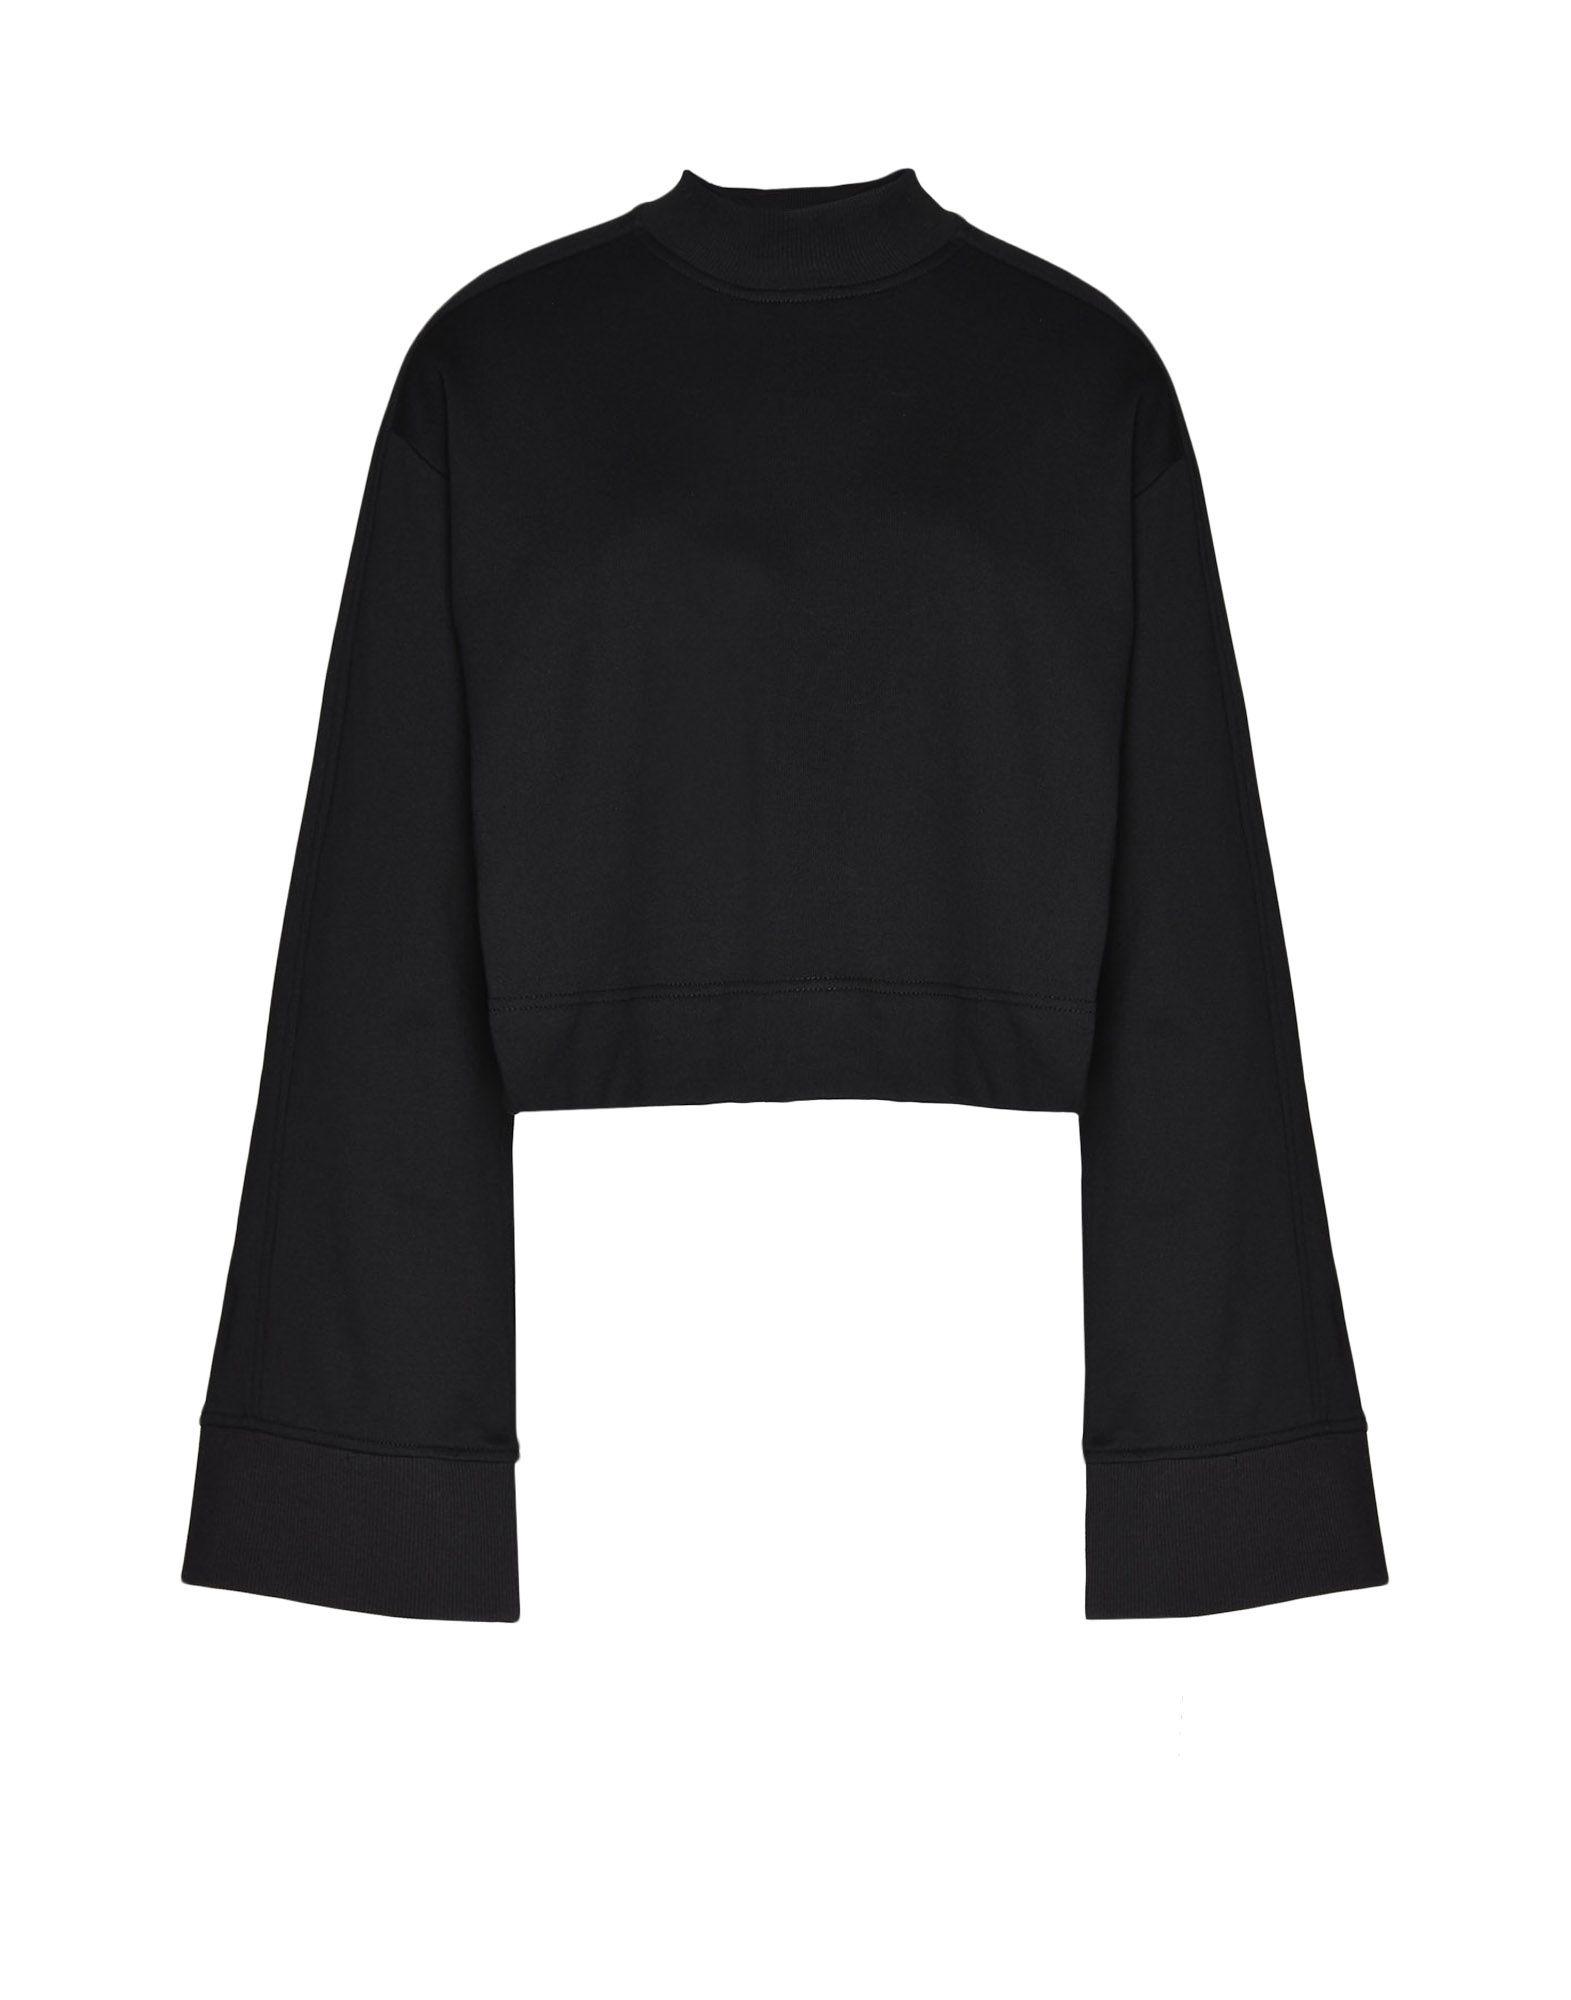 Y-3 Y-3 Stacked Logo Sweater Sweatshirt Woman f